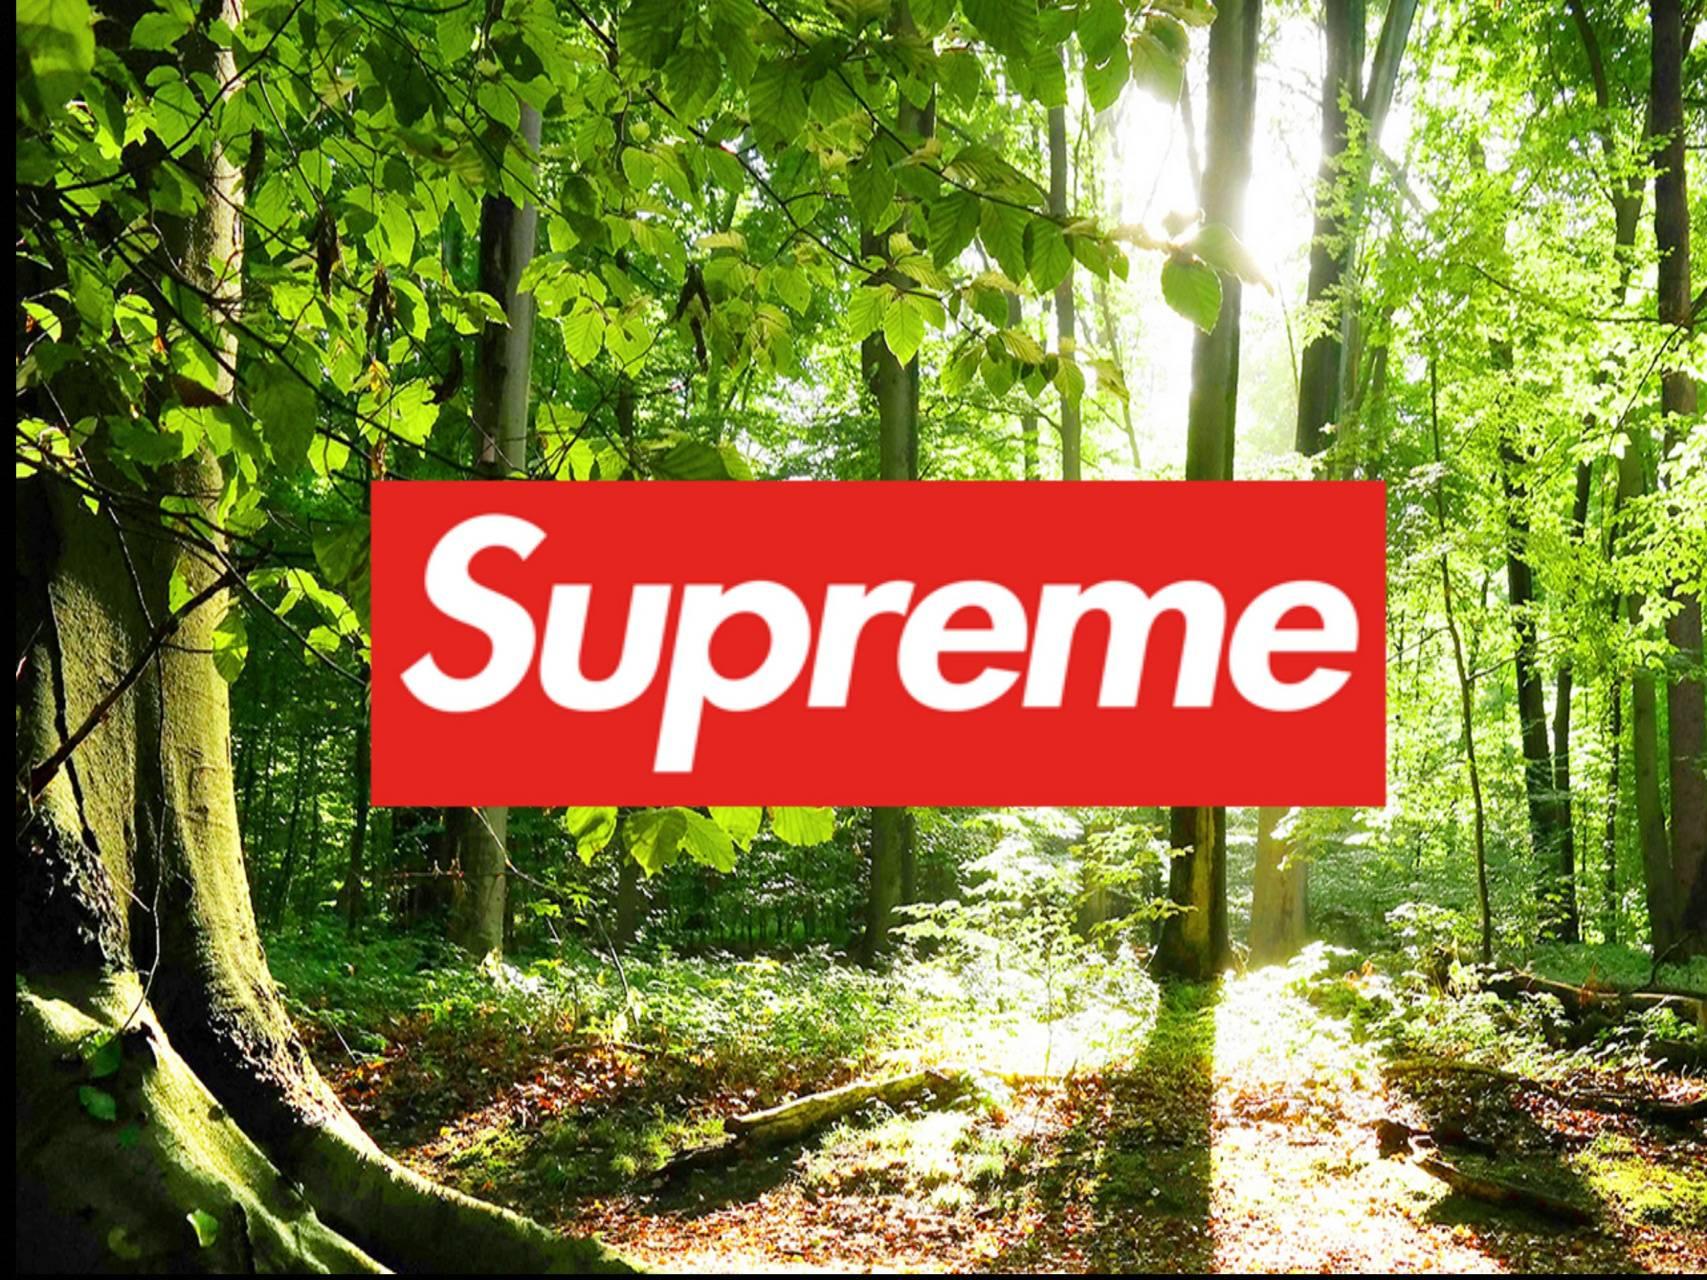 Supreme forest